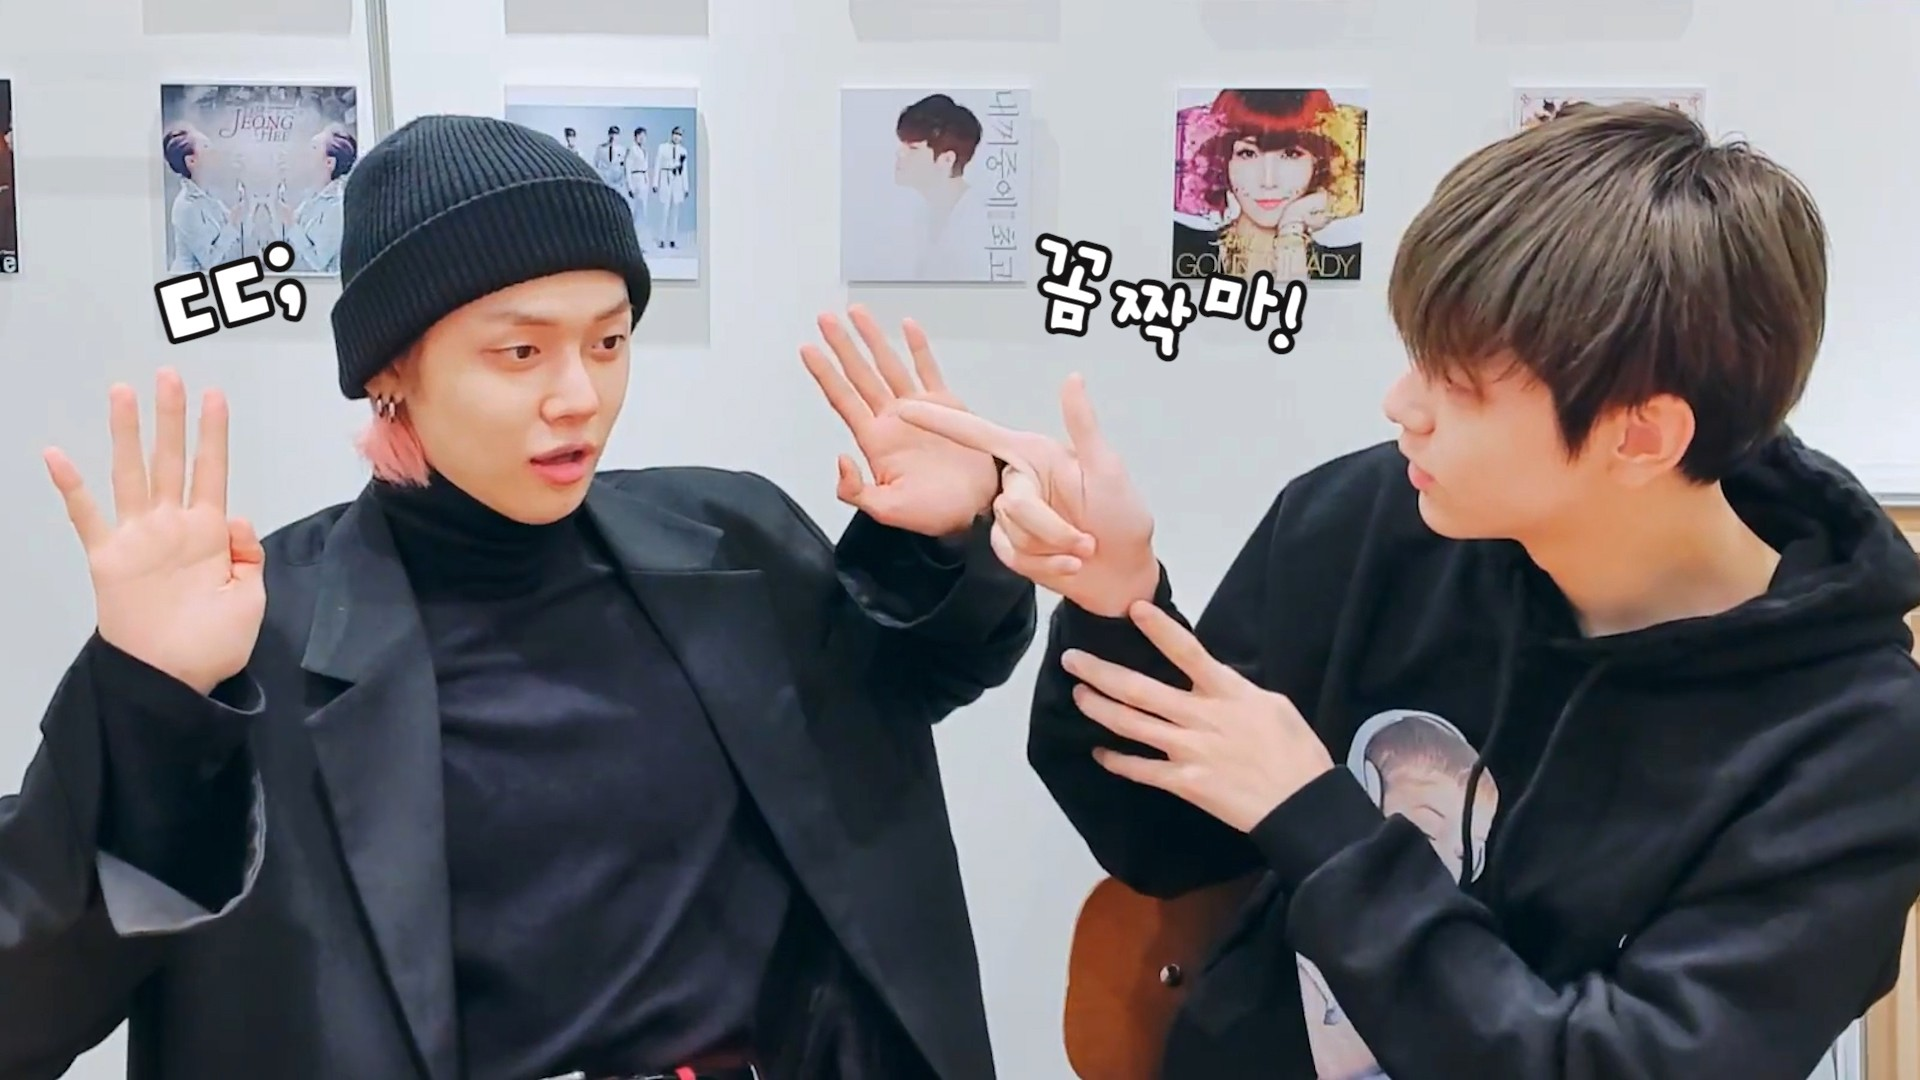 [TXT] 맞네.. 내 심장 도둑 전부 여기 모였네..🕵️💘 (YEONJUN&SOOBIN talking about mistaking coat)